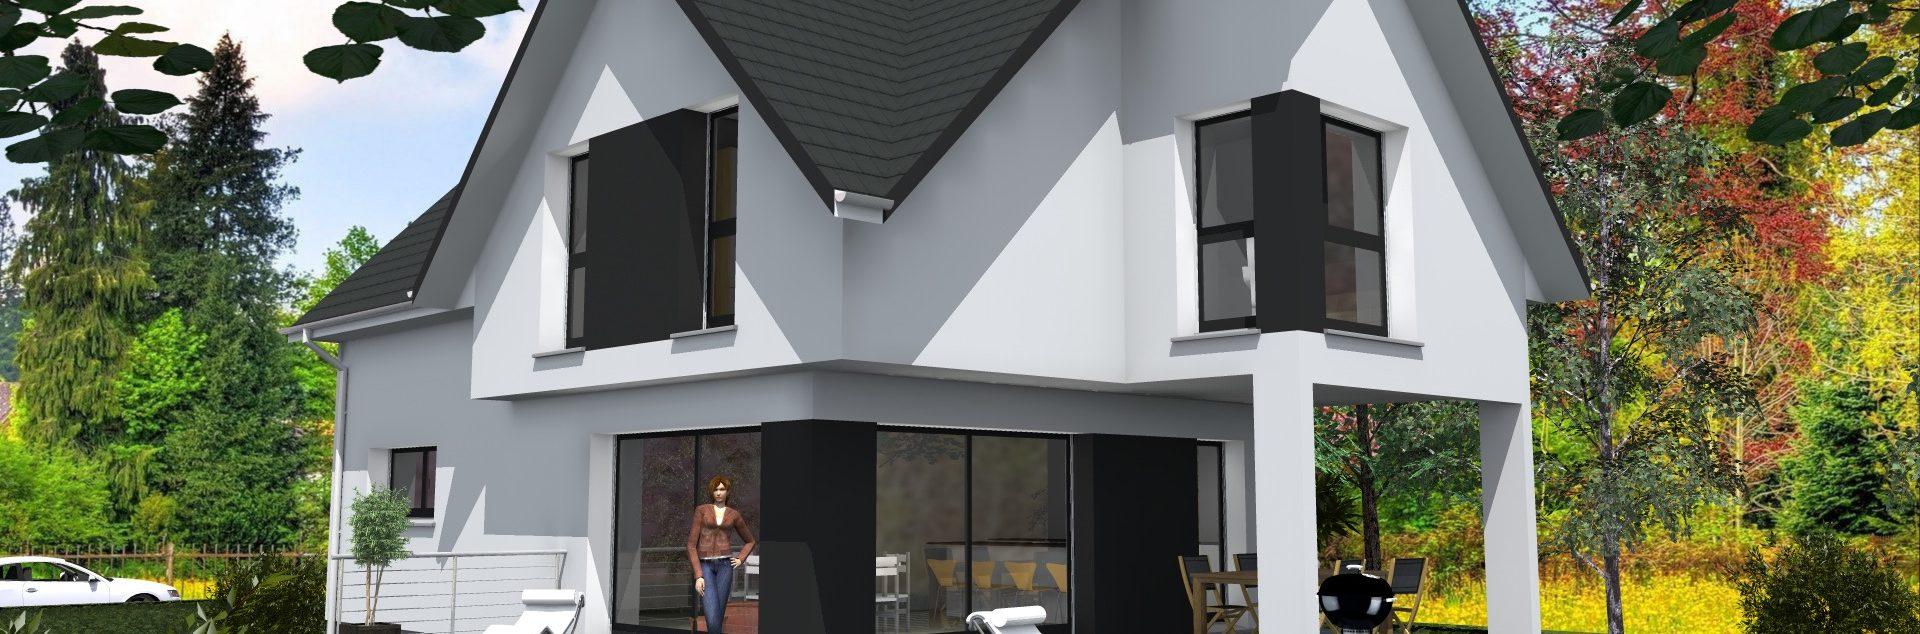 140 m²